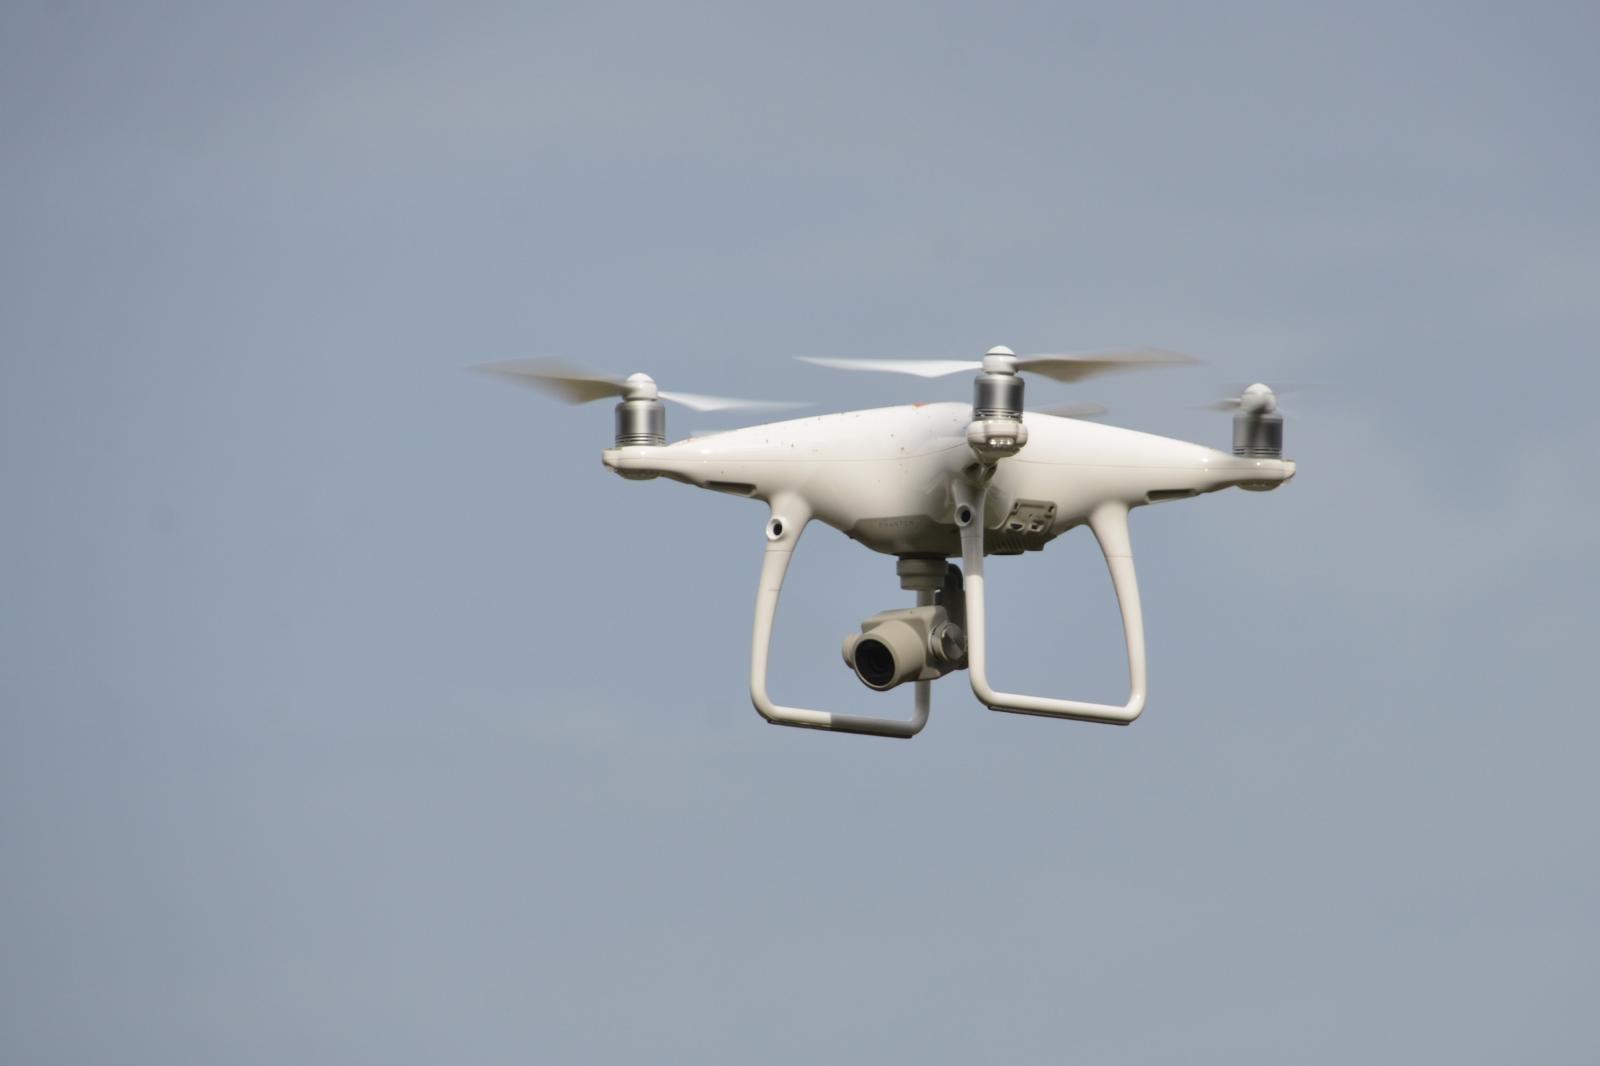 Dron s kamero Vir: Pixsell